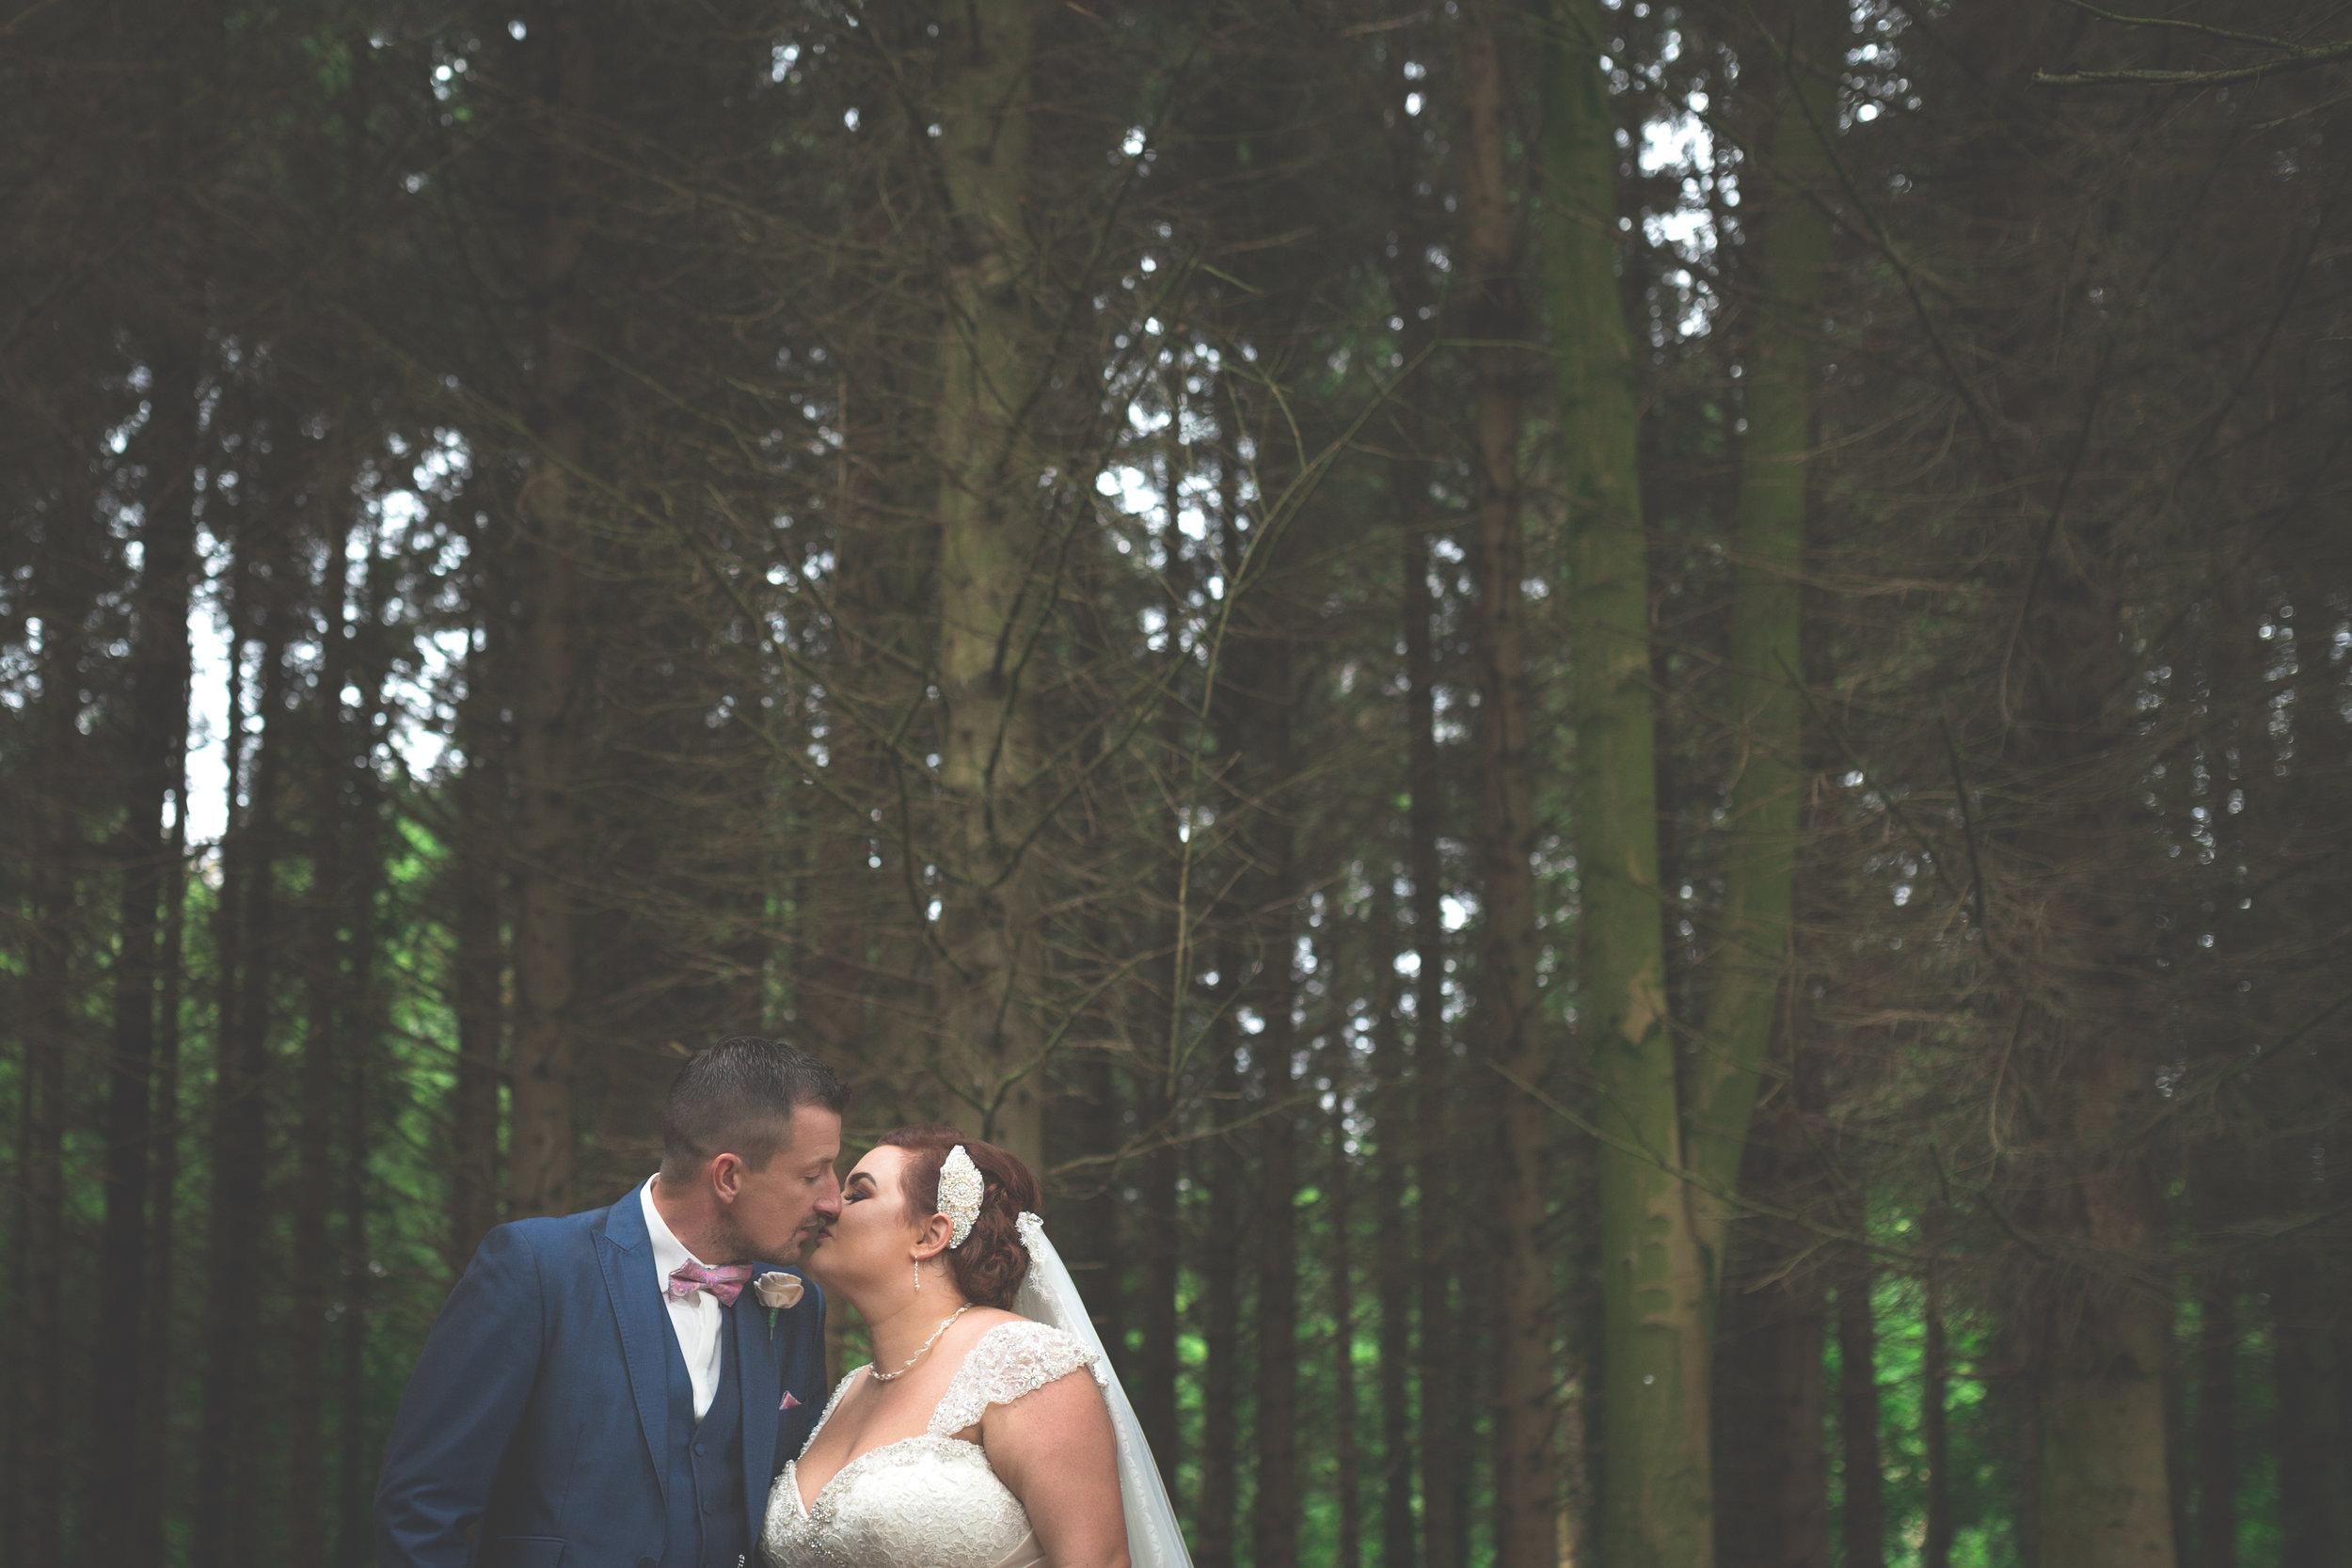 Antoinette & Stephen - Portraits   Brian McEwan Photography   Wedding Photographer Northern Ireland 23.jpg